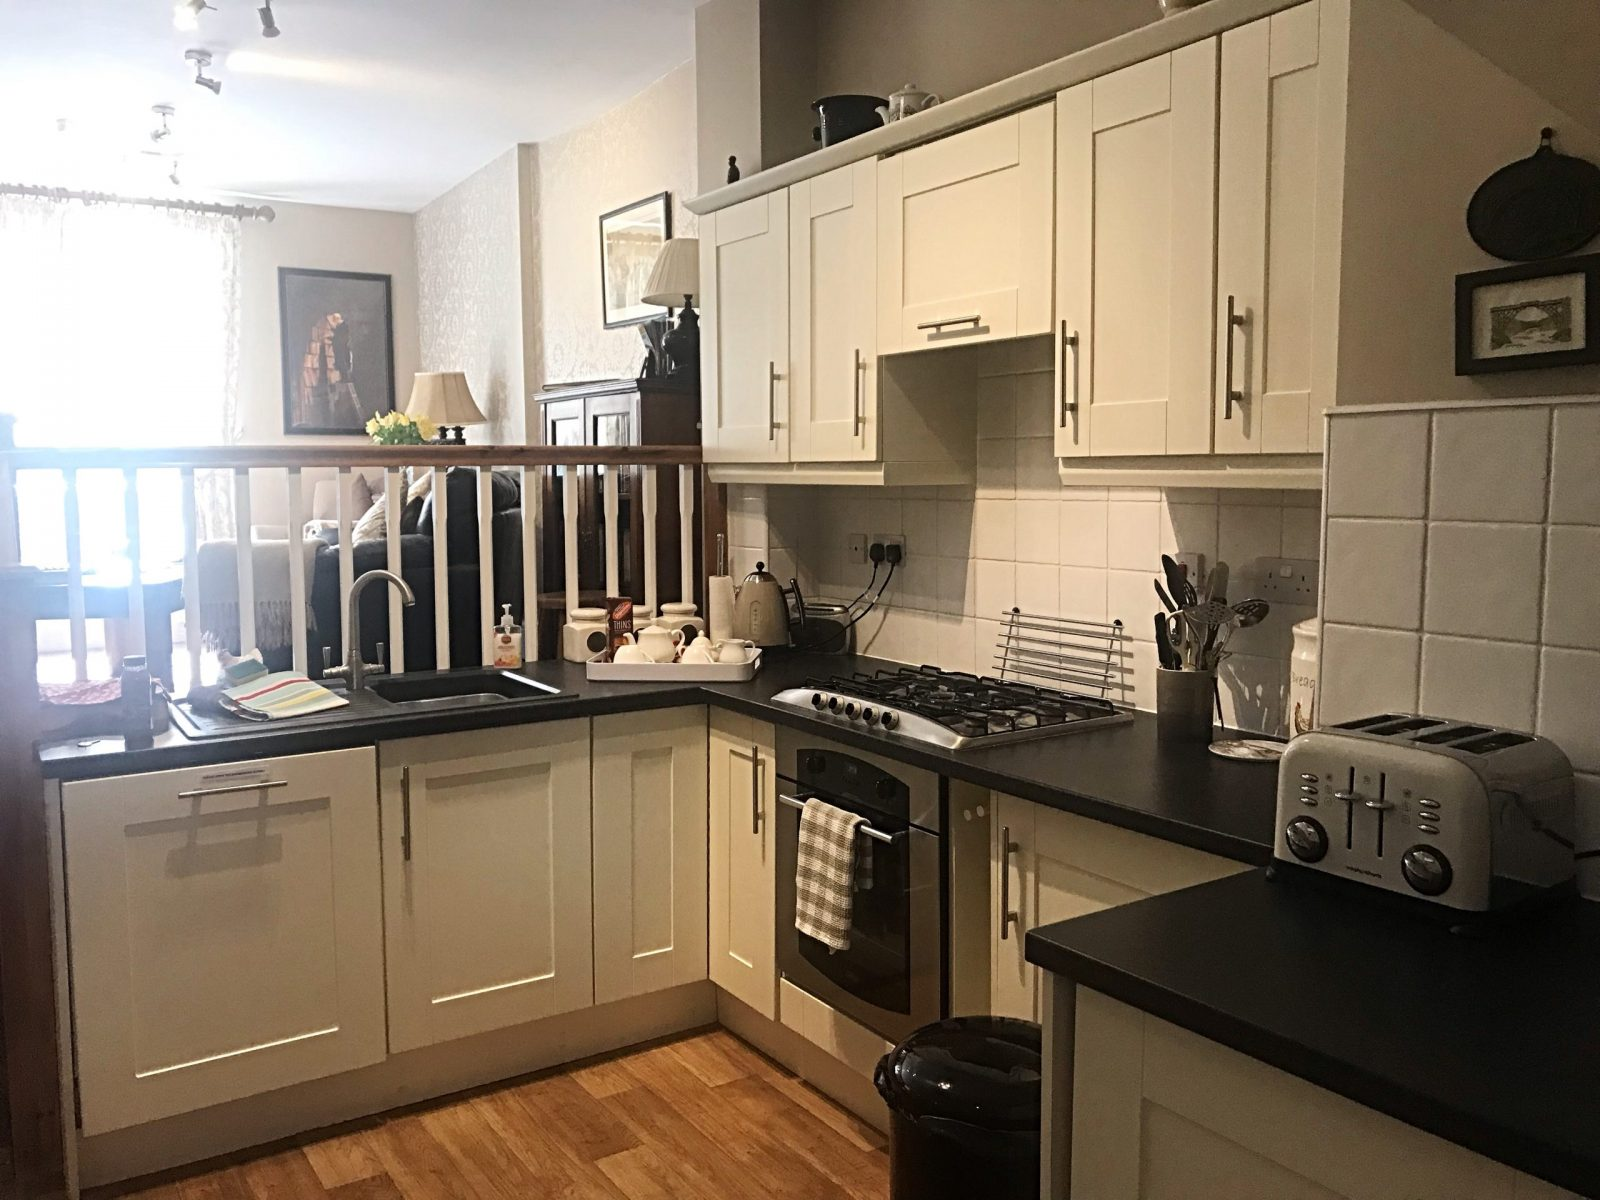 Visiting Ironbridge a 3 day itinerary Ironbridge view townhouse kitchen